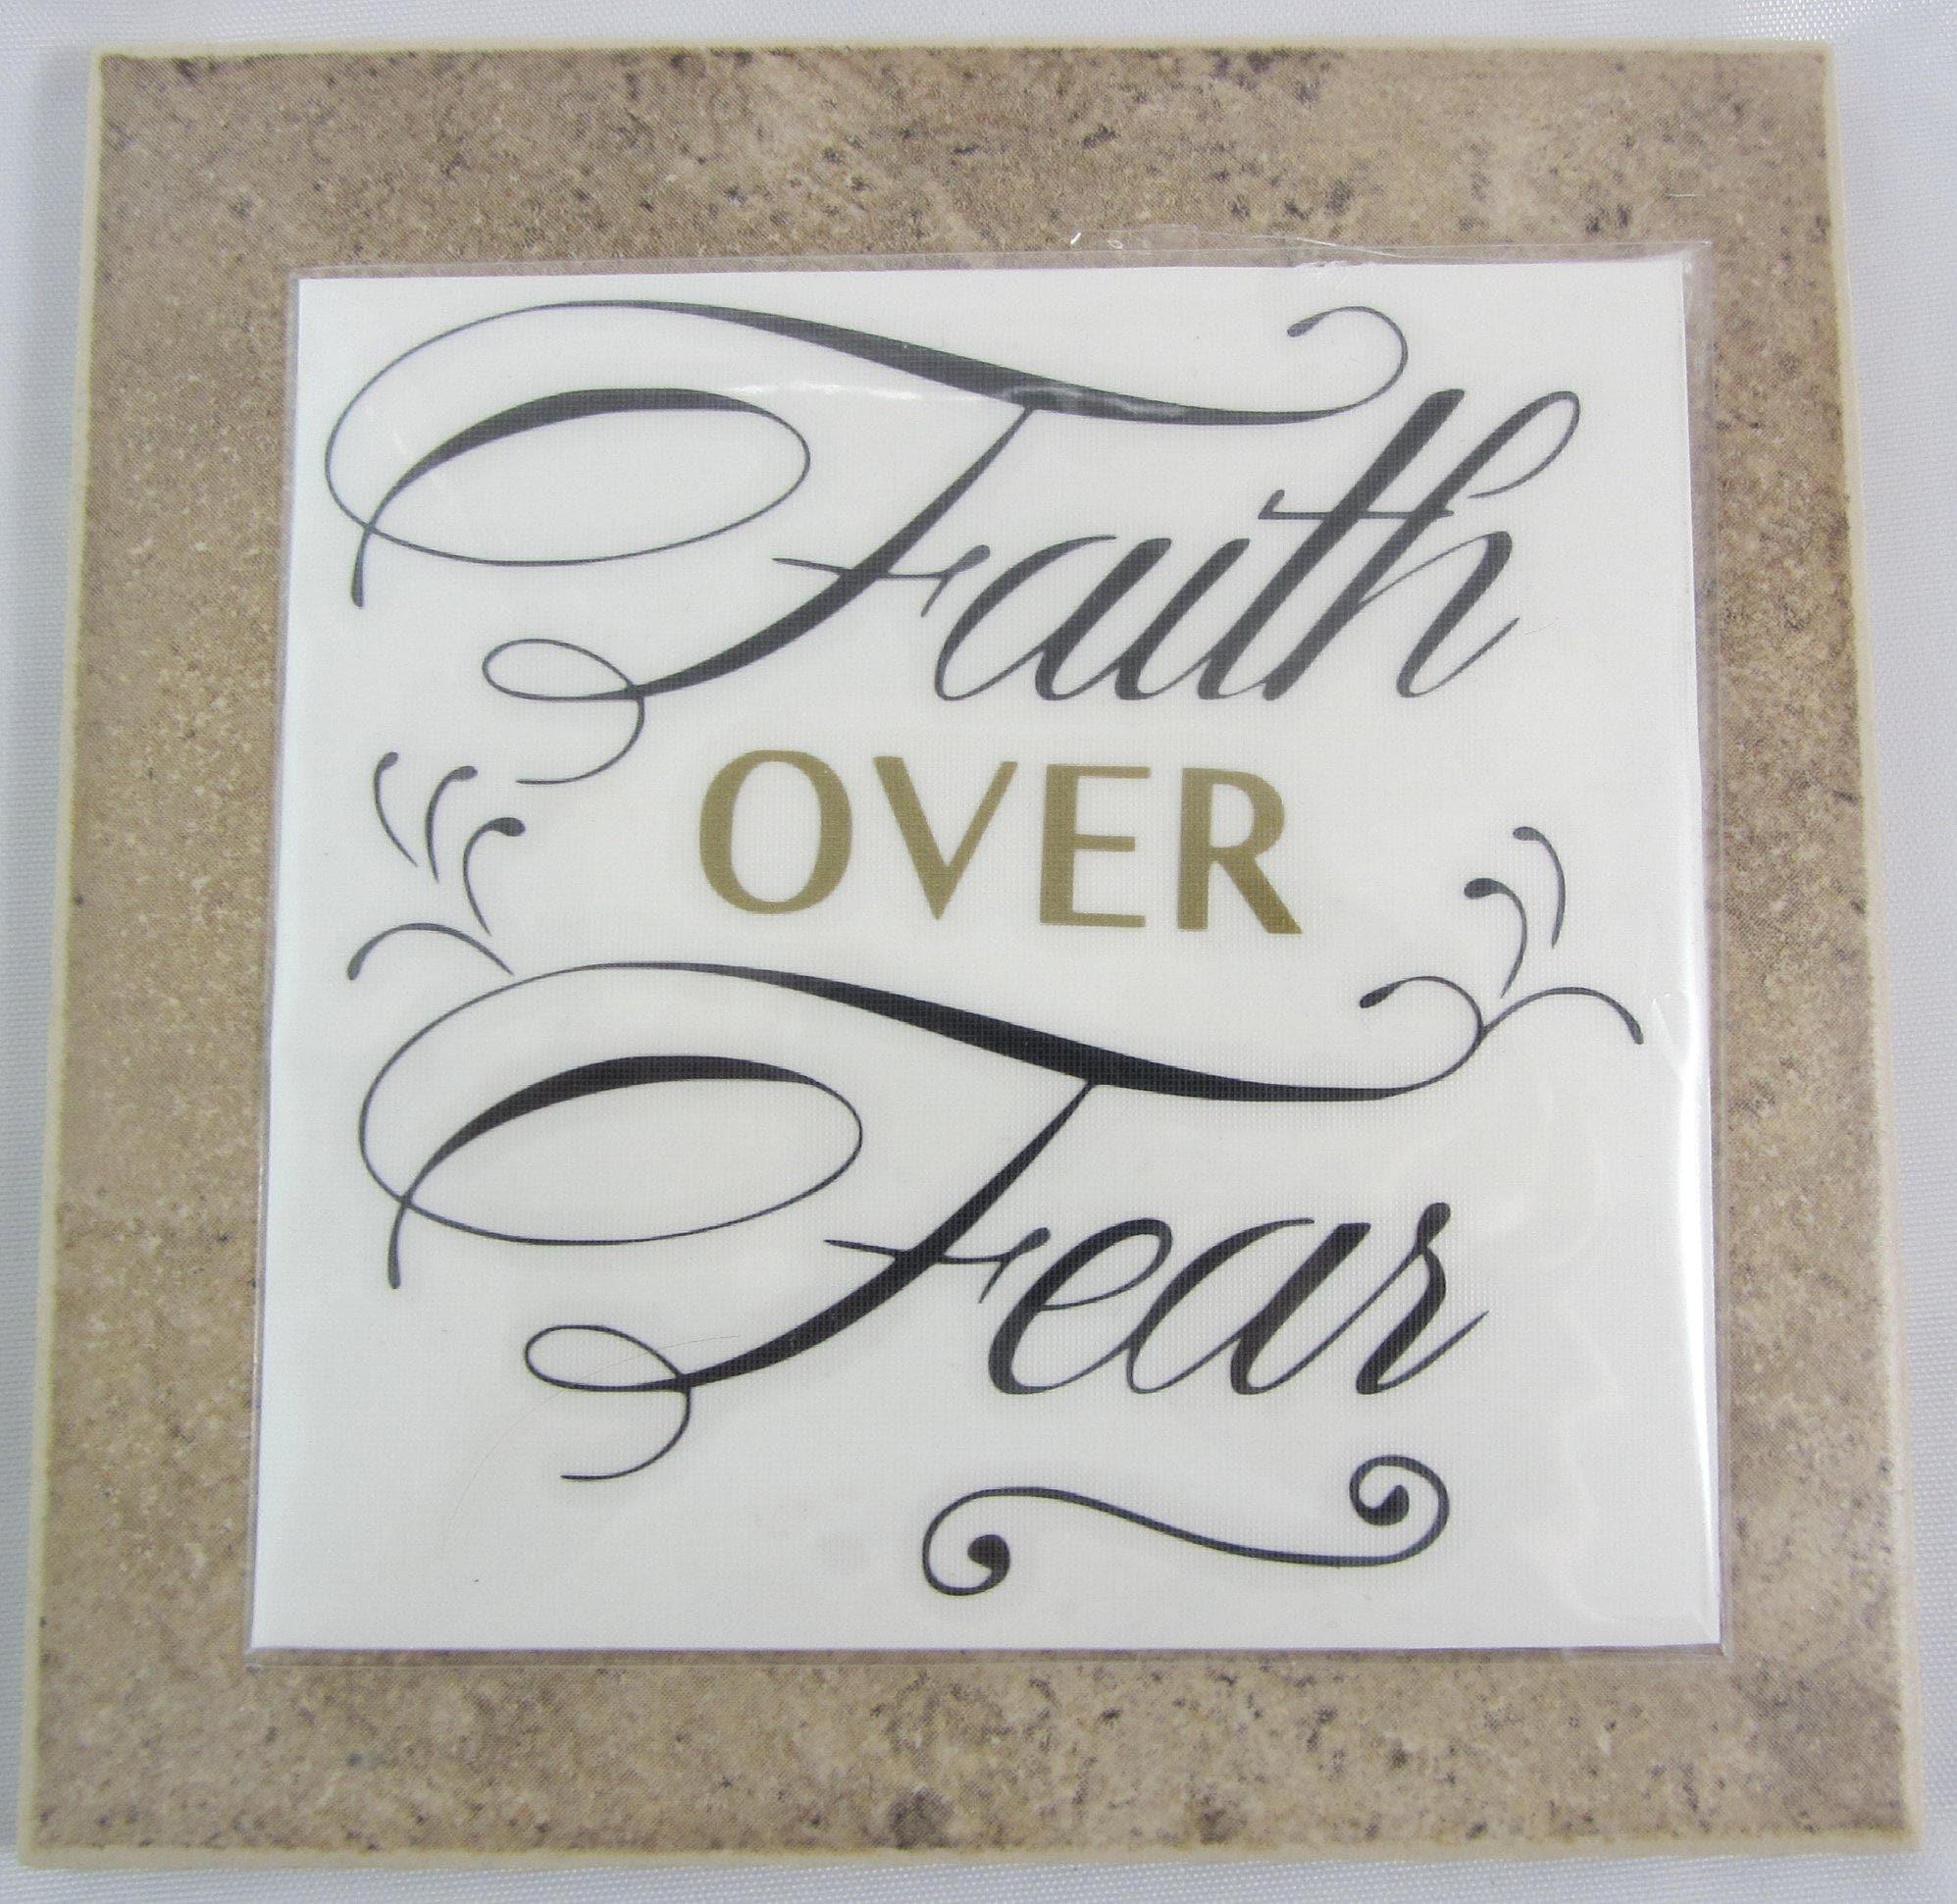 Faith Over Fear Vinyl Sticker Adhesive Vinyl Window Vinyl - Custom vinyl stickers hong kong